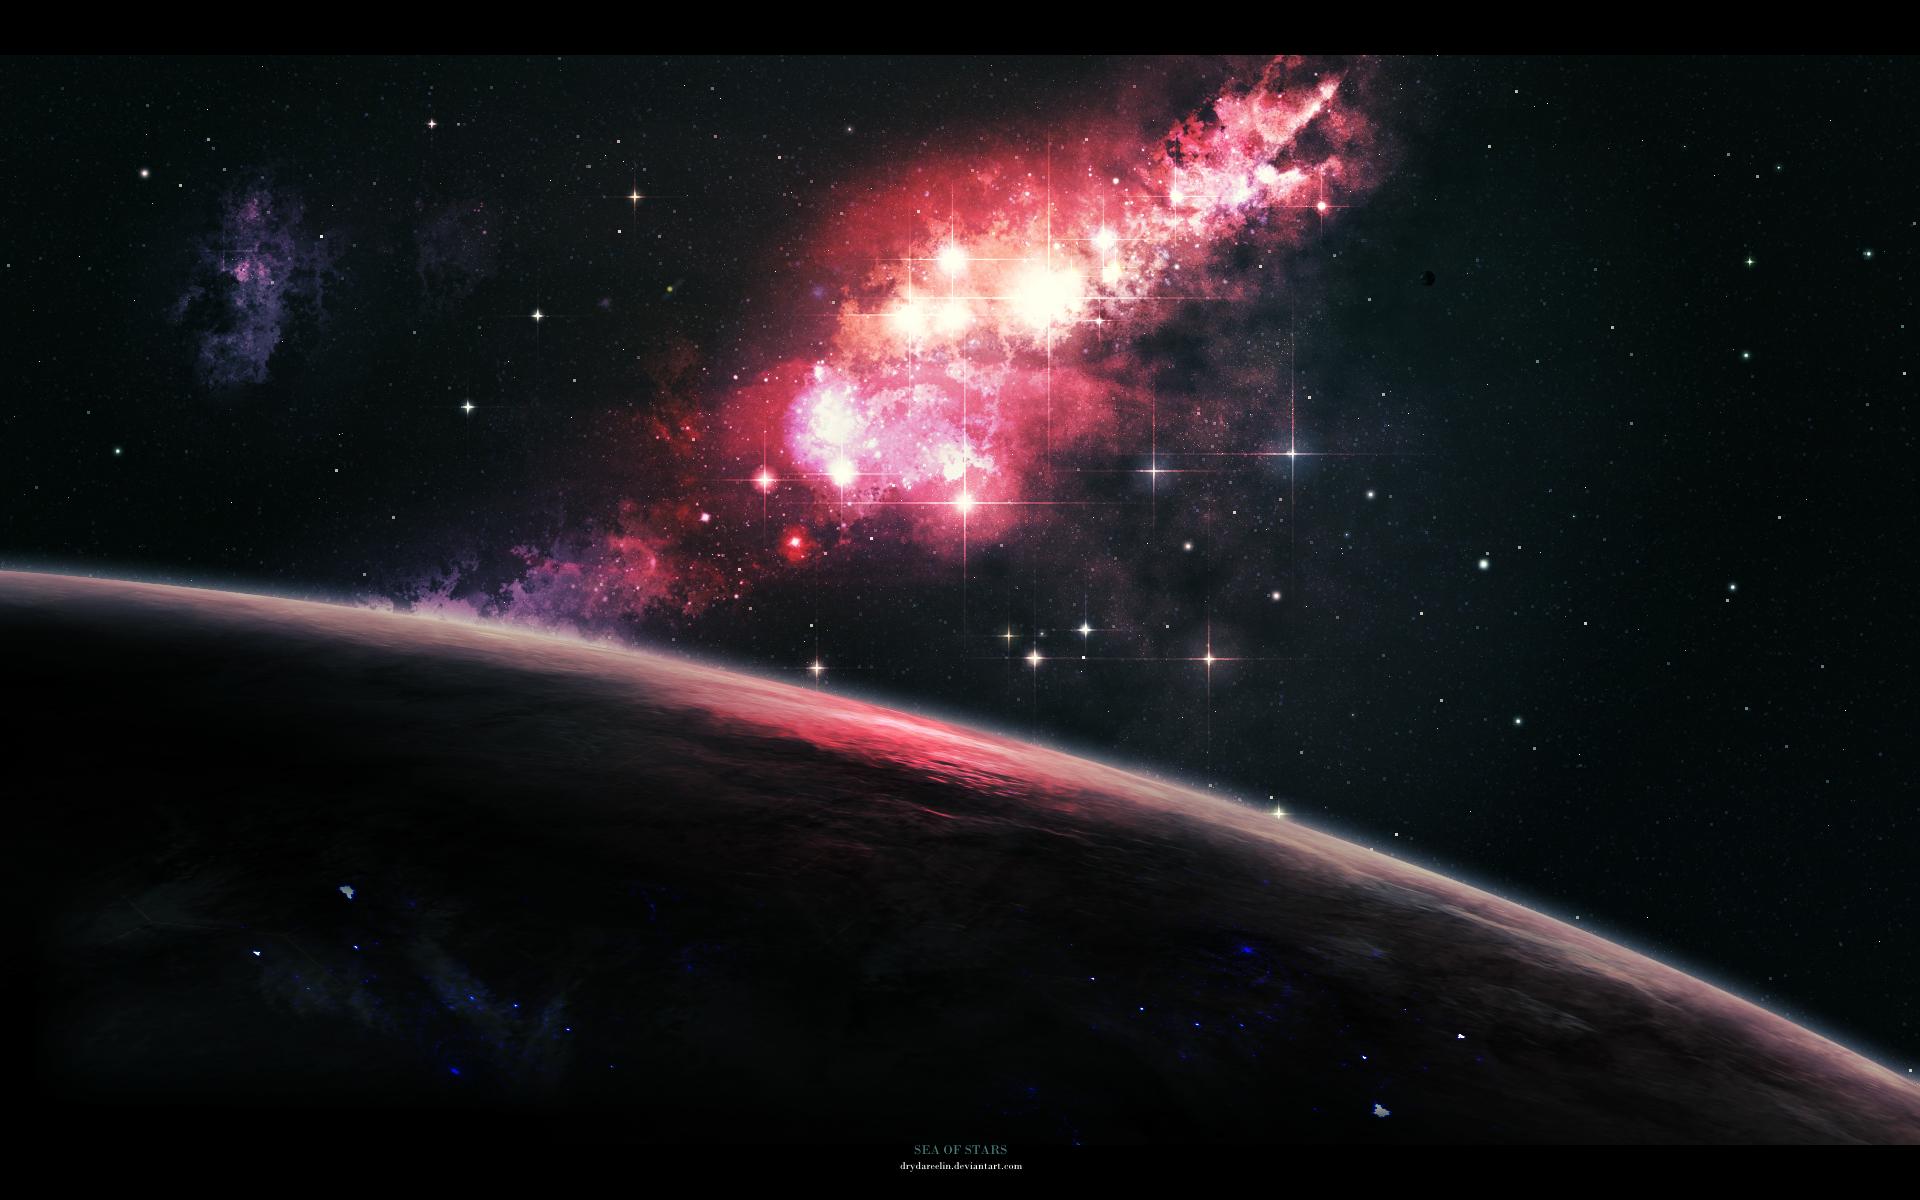 sea_of_stars_by_drydareelin-d7exv22.png